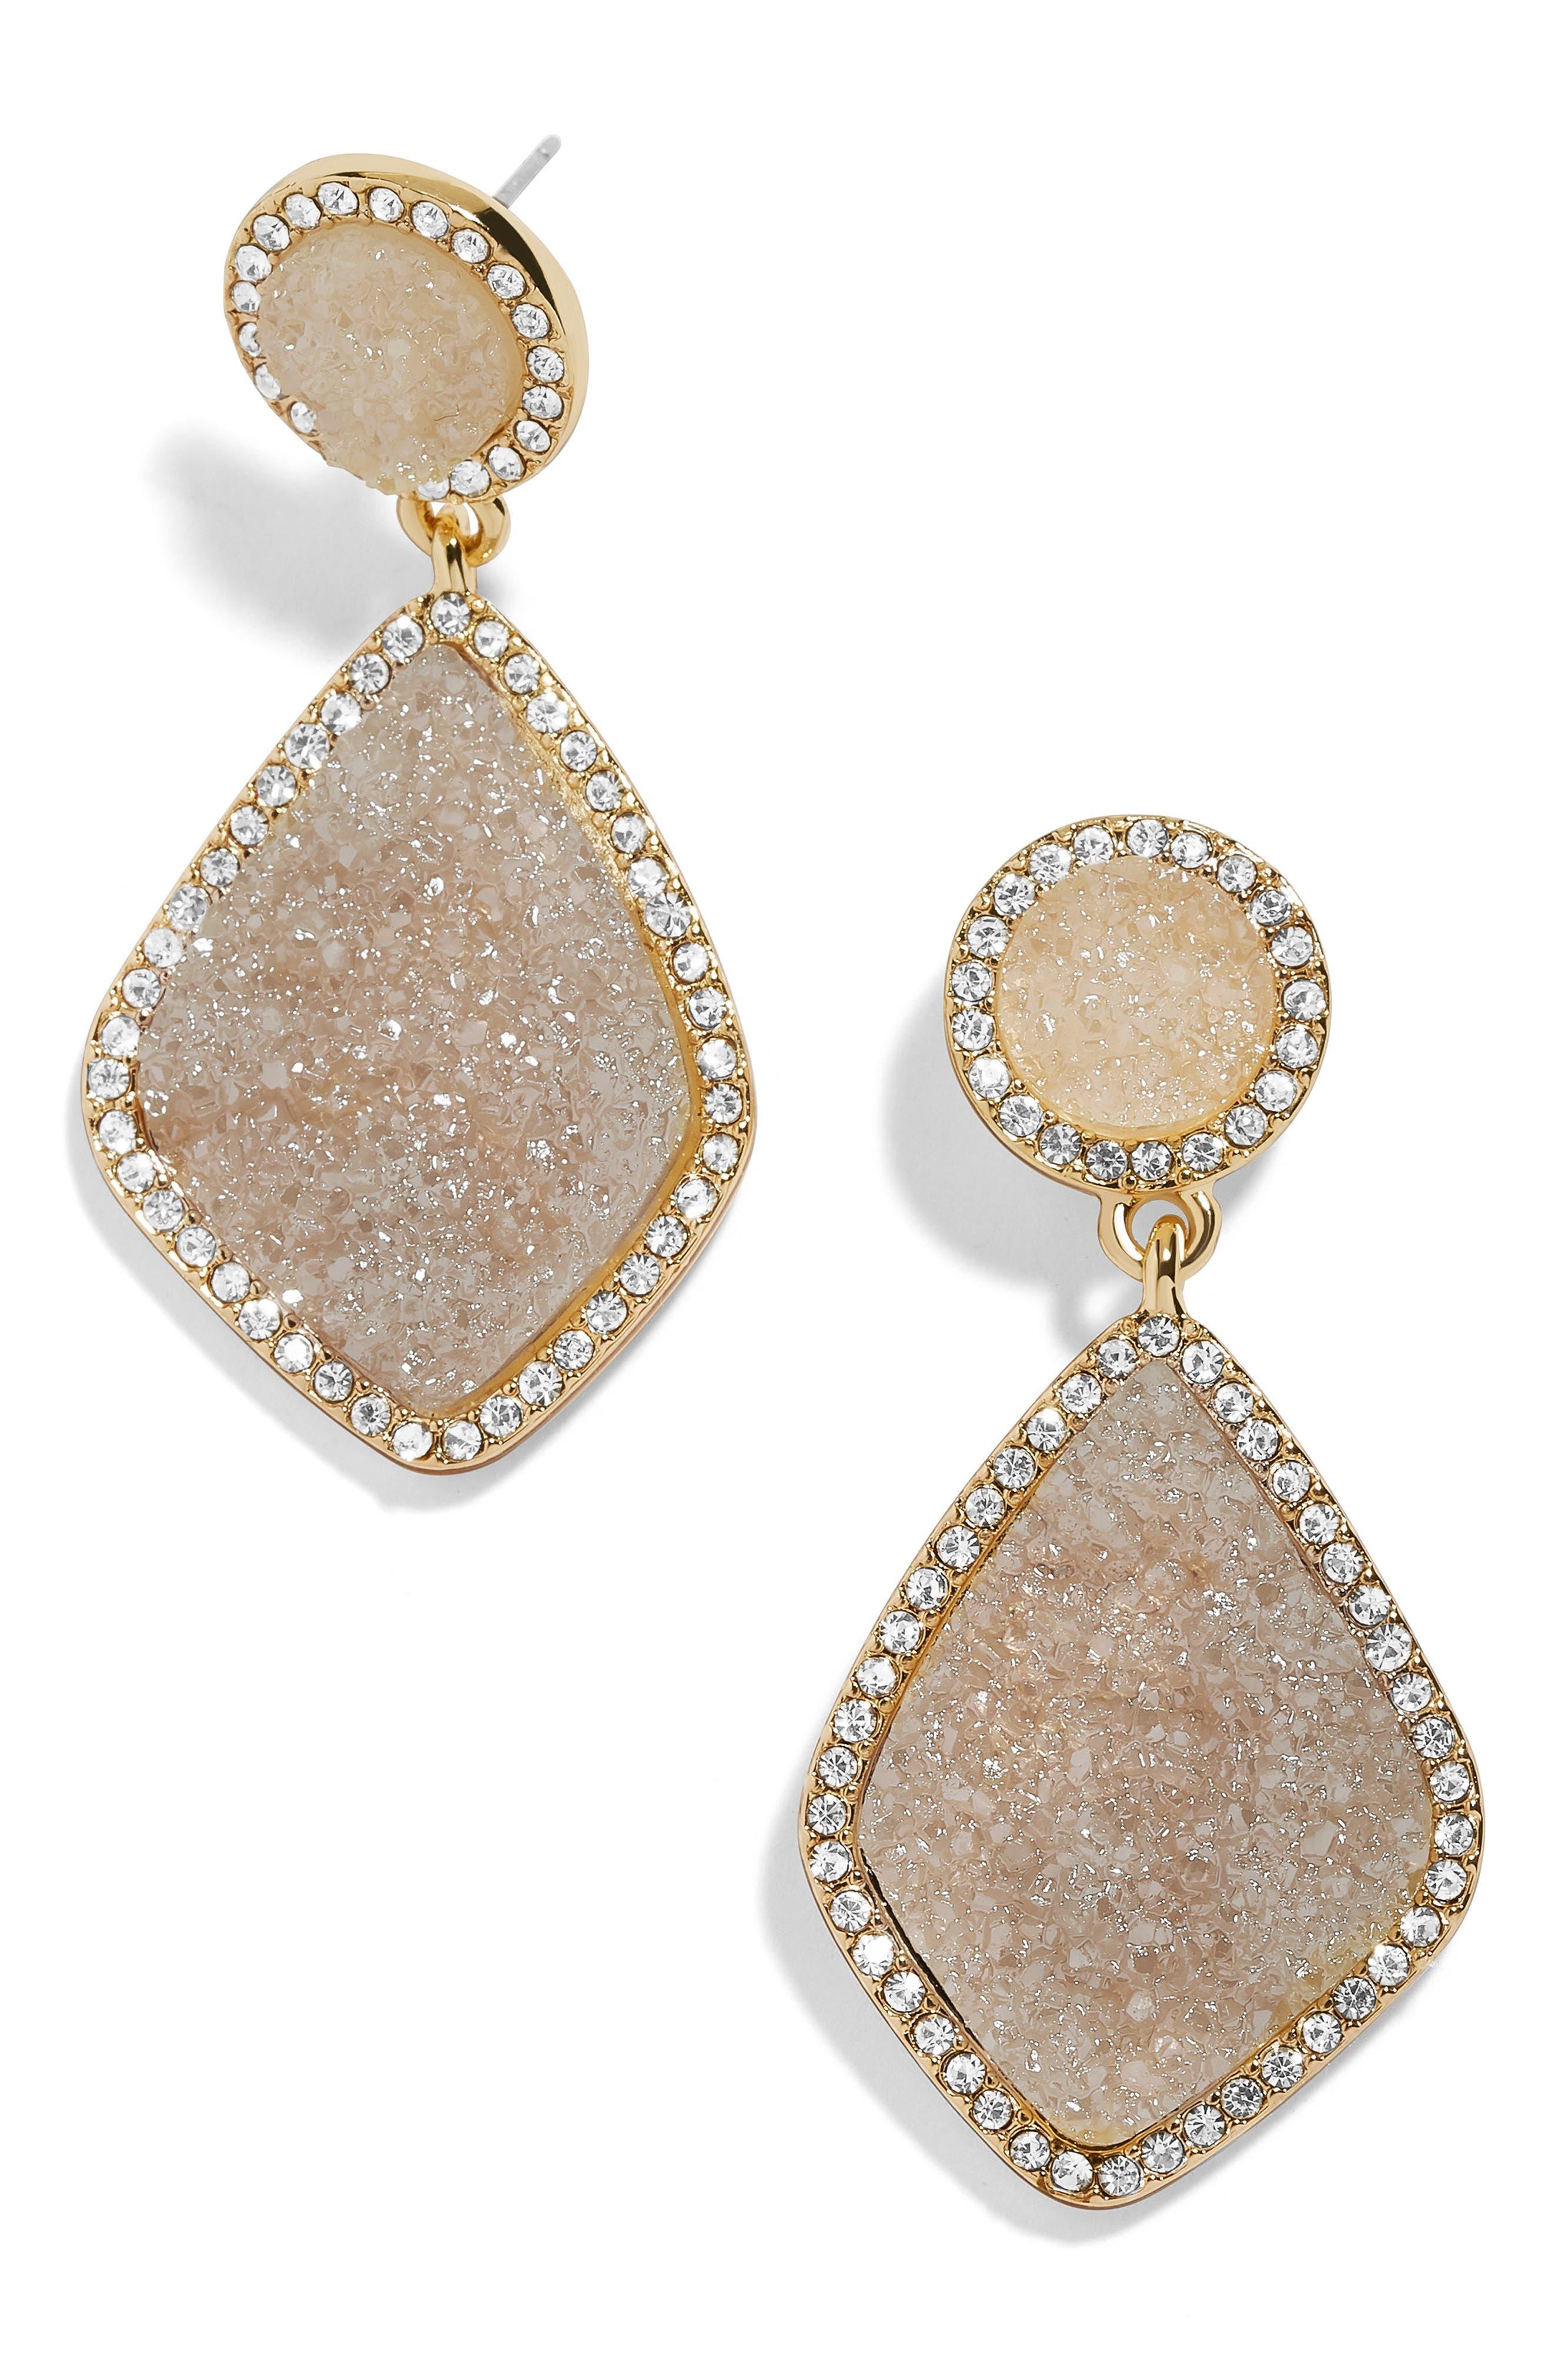 BAUBLEBAR Ember Drop Earrings, Main, color, 021